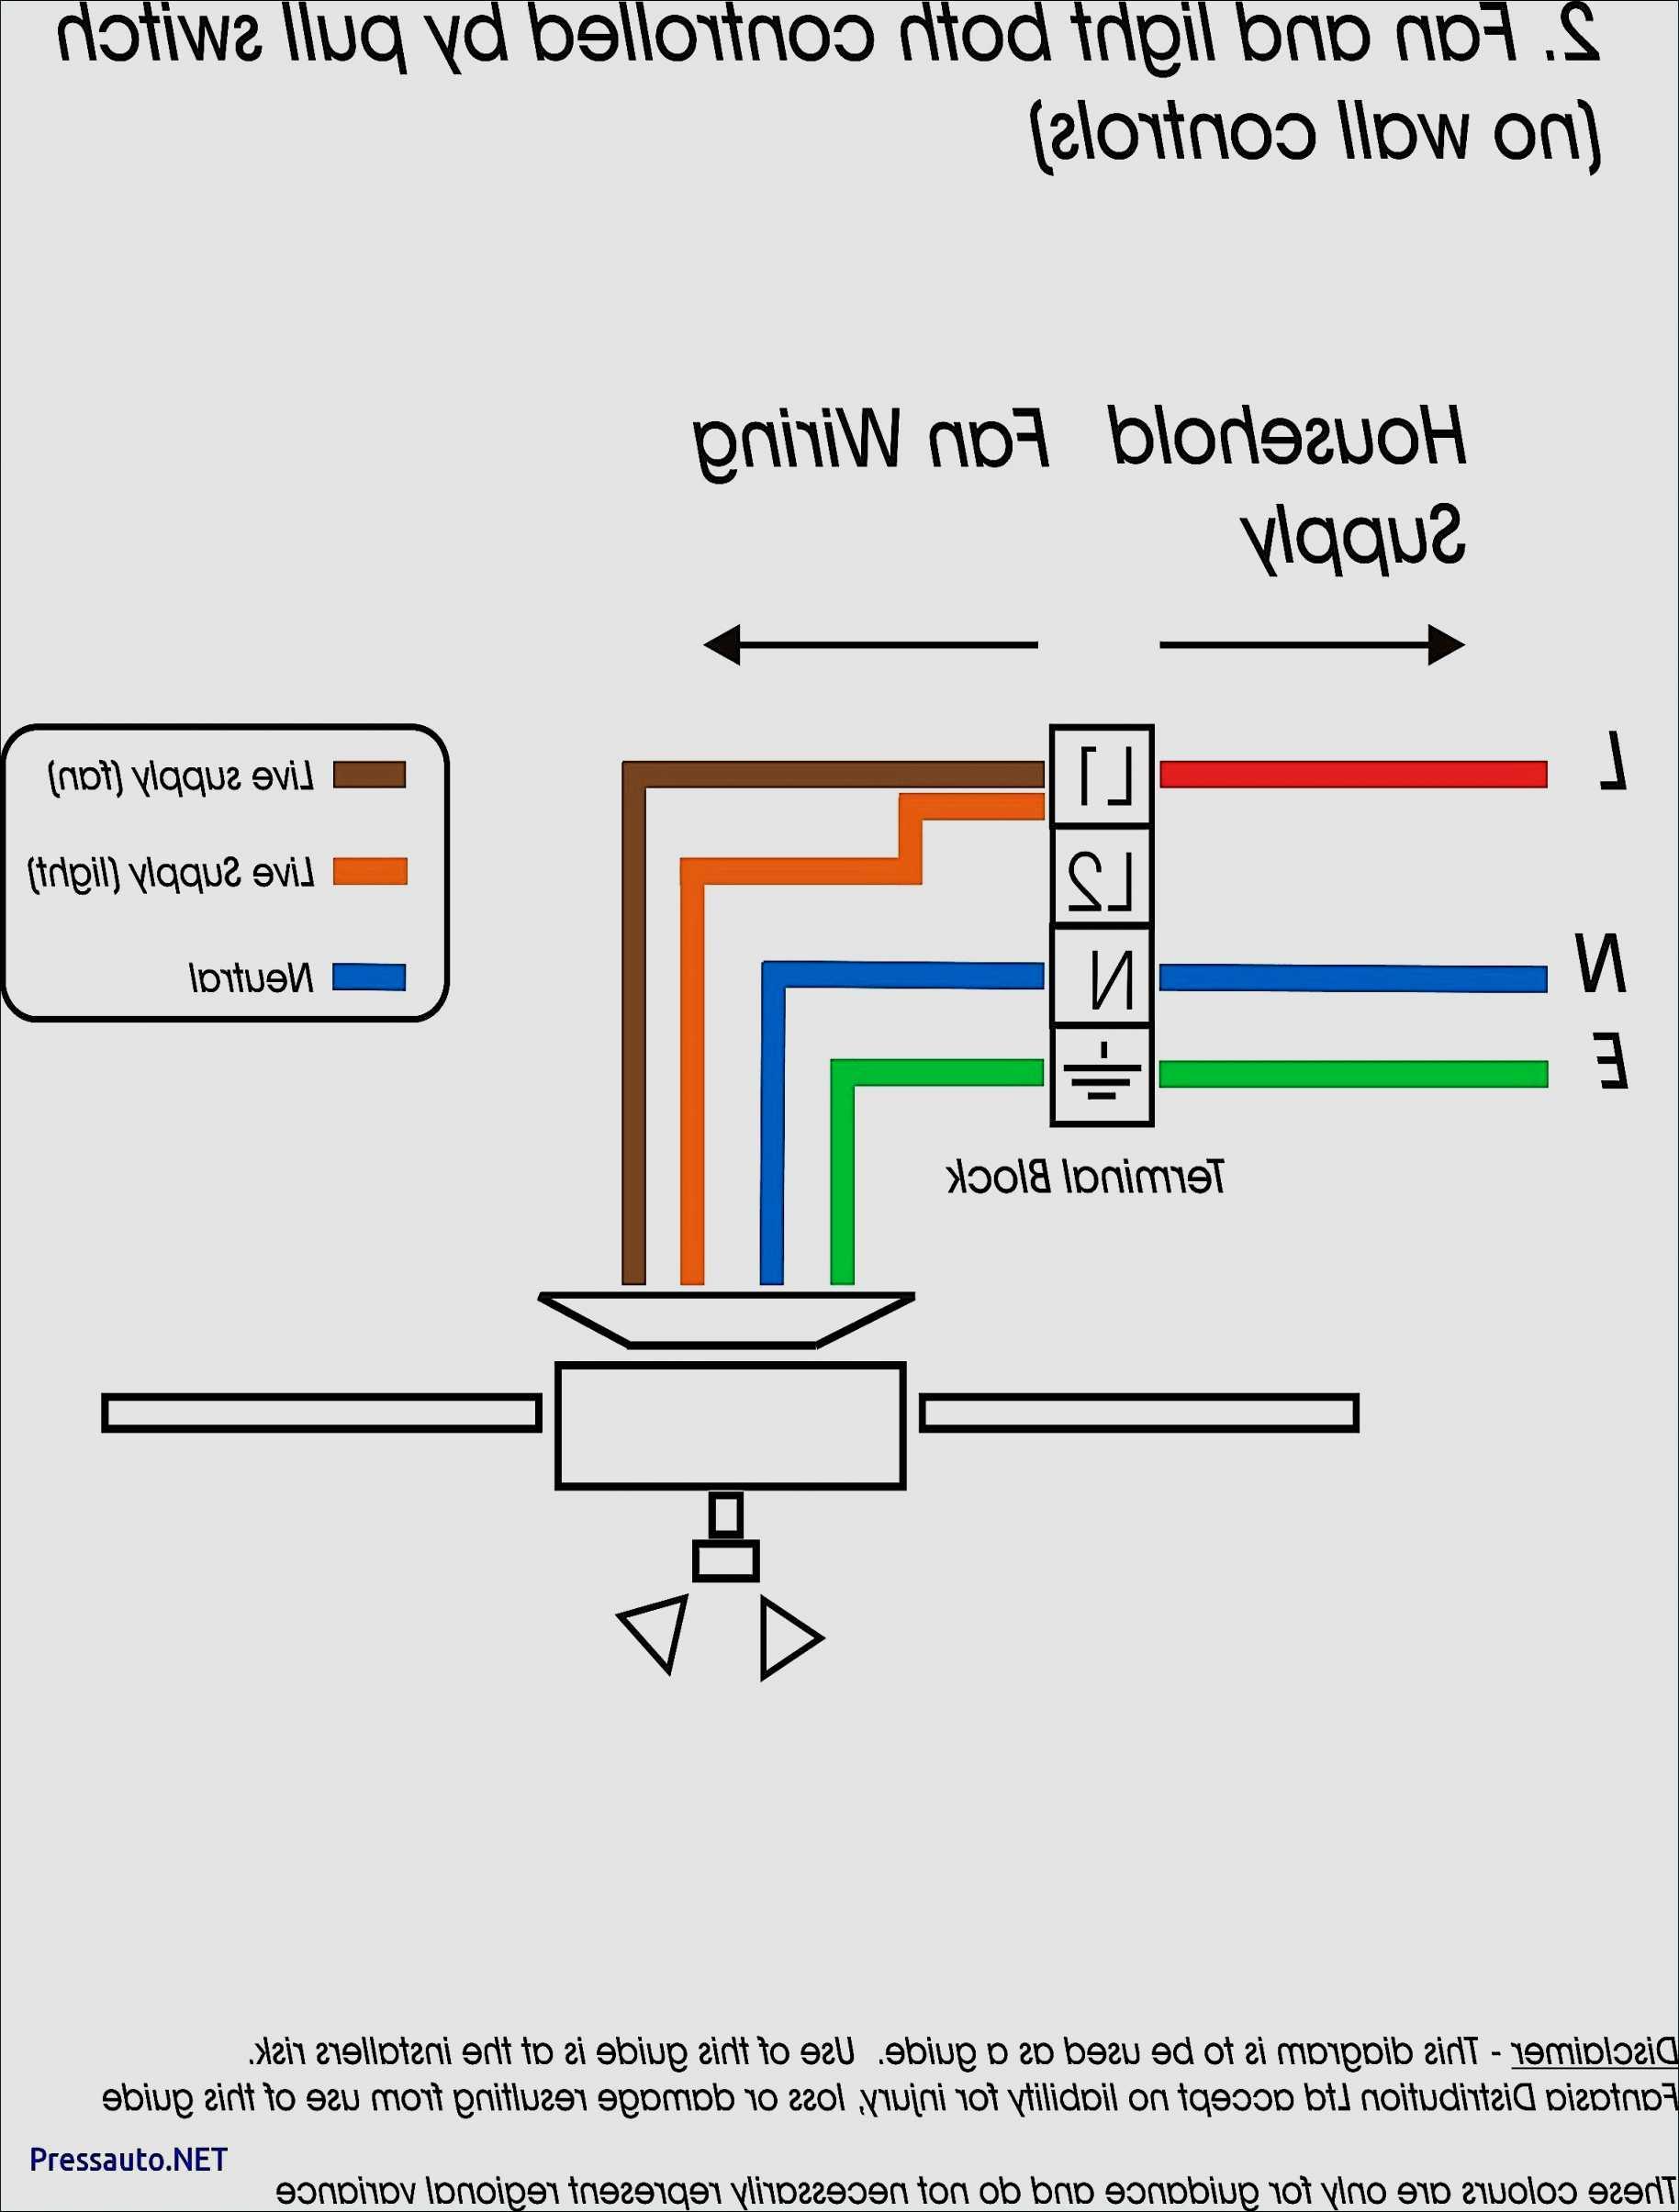 Rca Cable Wiring Diagram : cable, wiring, diagram, Micro, Cable, Wiring, Diagram, Ethernet, Scotts-s1642.au-delice-limousin.fr